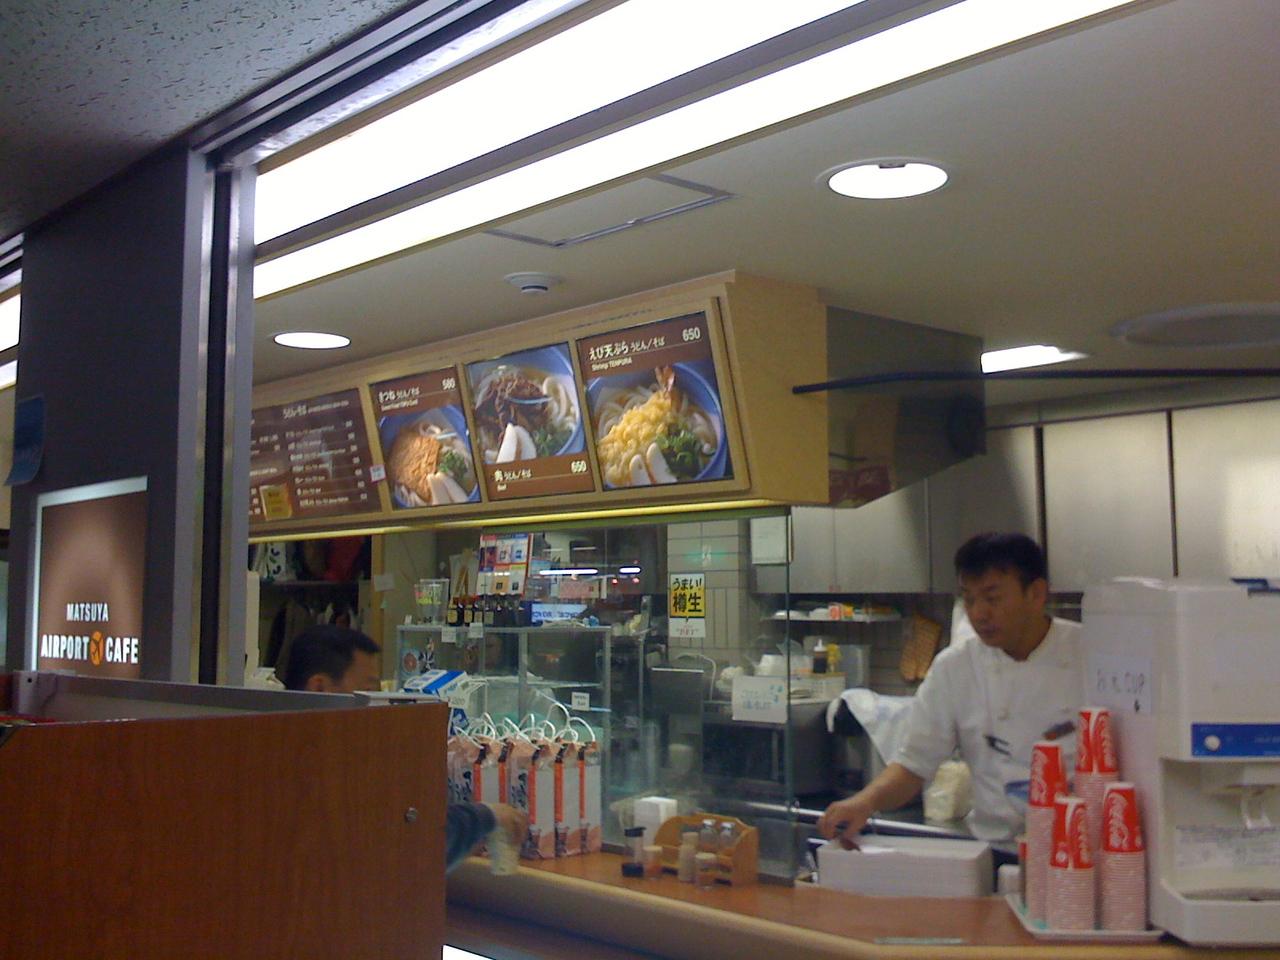 2008 11 24 Mon - Matsuya Airport Café in Osaka, Japan airport